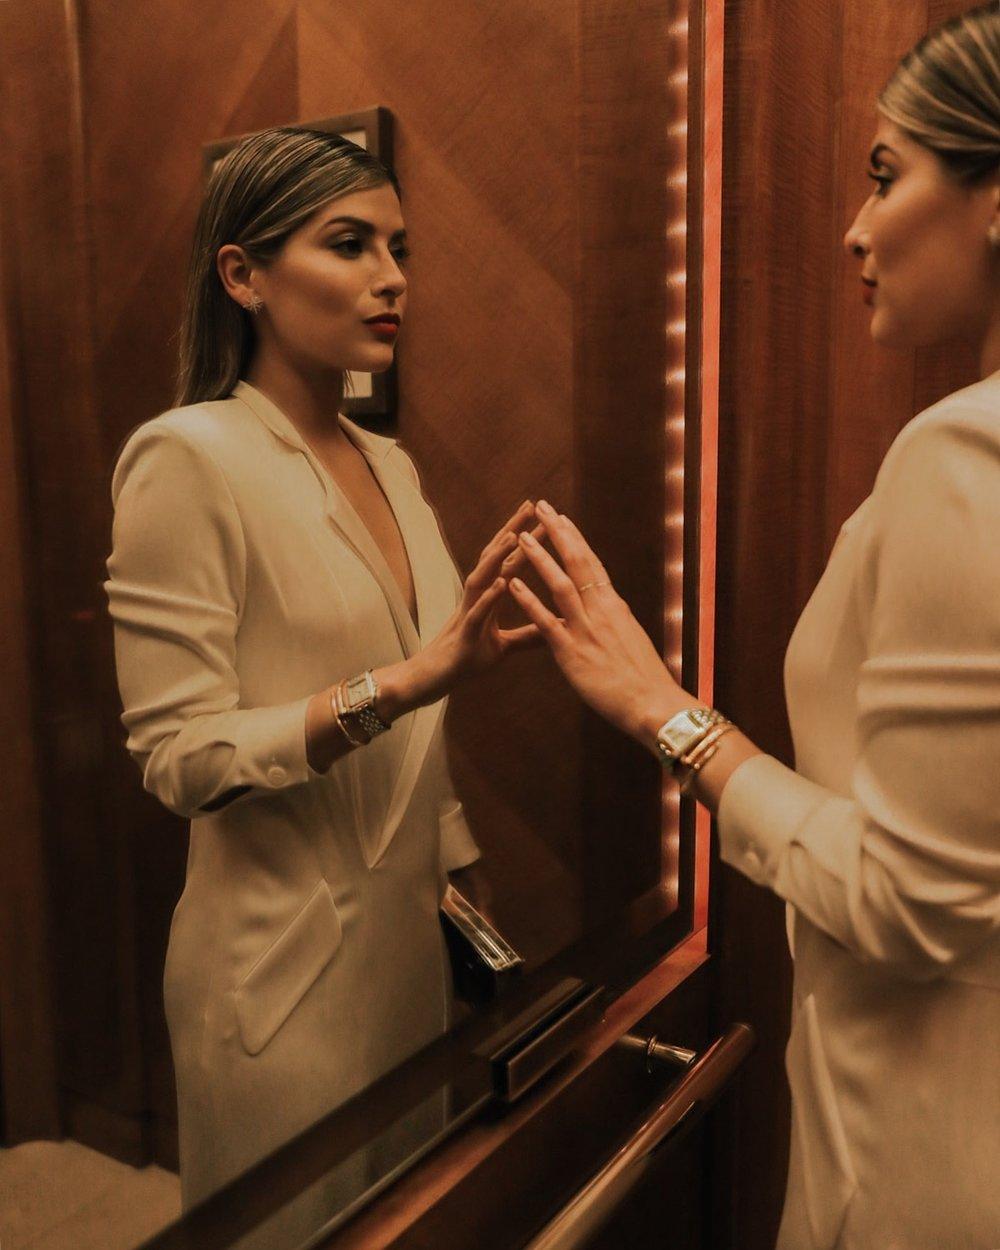 Pam Hetlinge r for Cartier | Photo by  Andrea Posadas